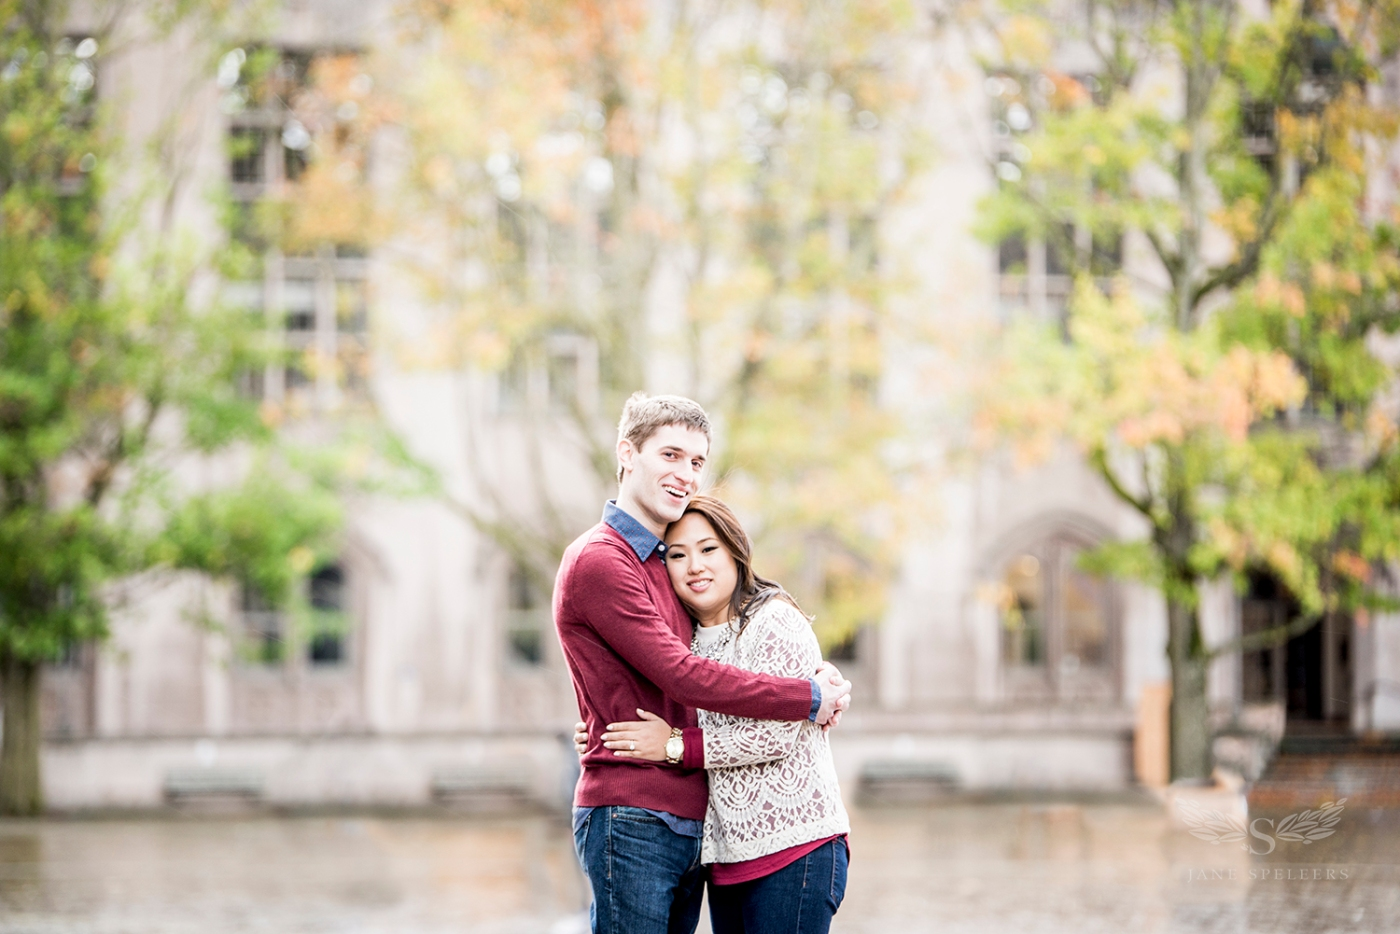 Engagement-UW-Lawcampus_Rebecca_and_Evan DSC_4184 copy